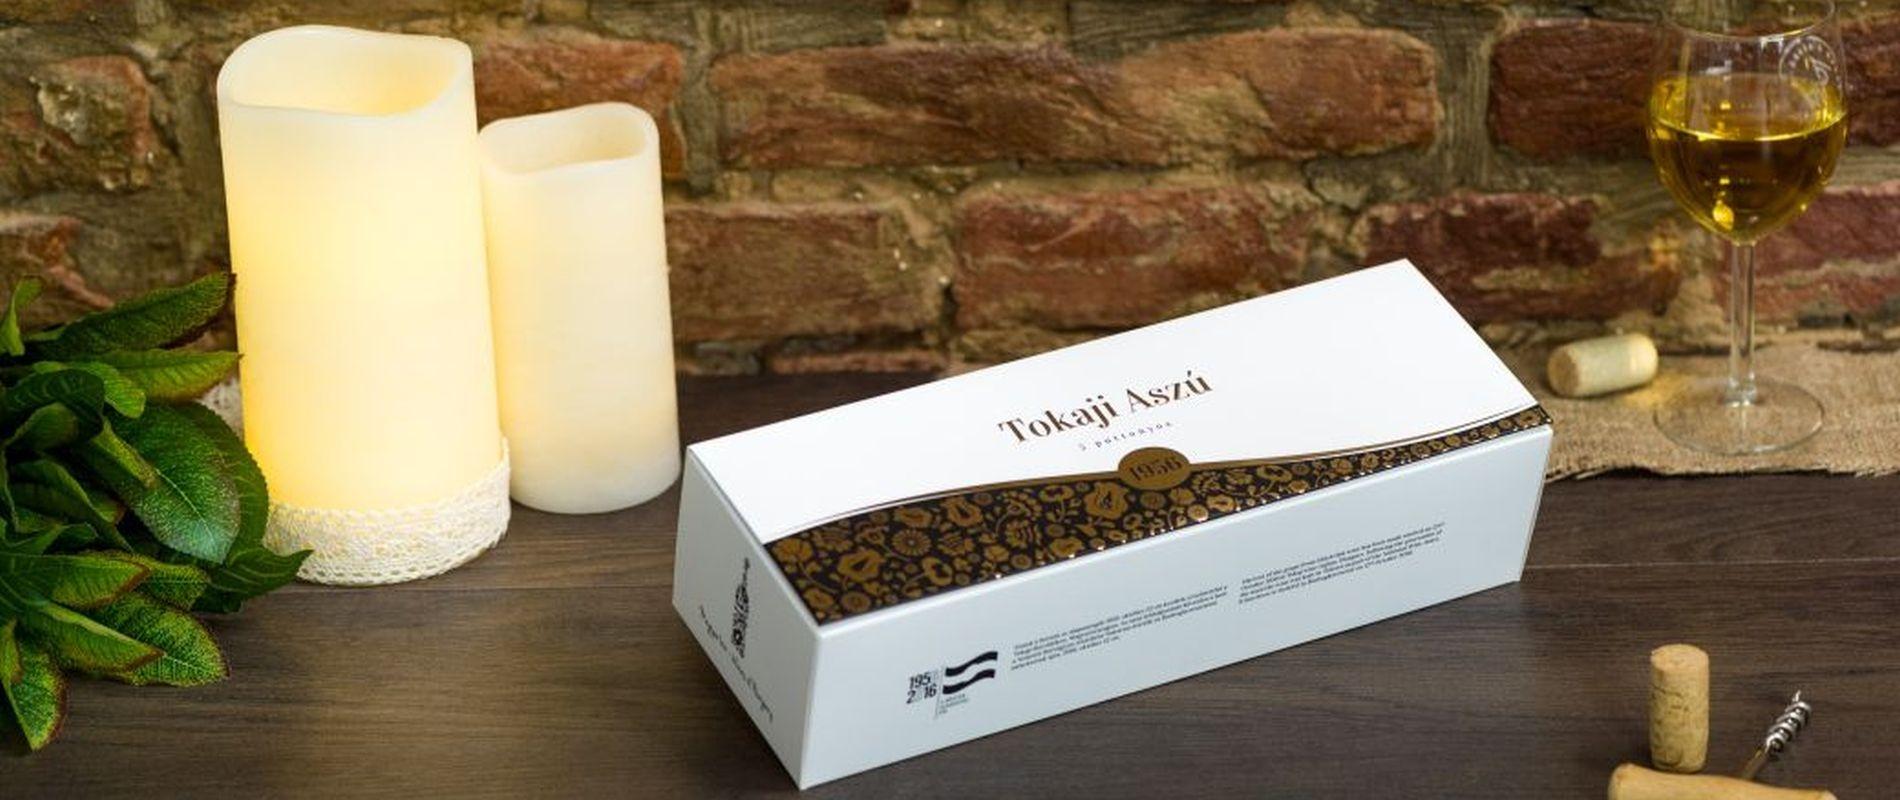 Gift box for the Tokaji Aszú vintage of 1956